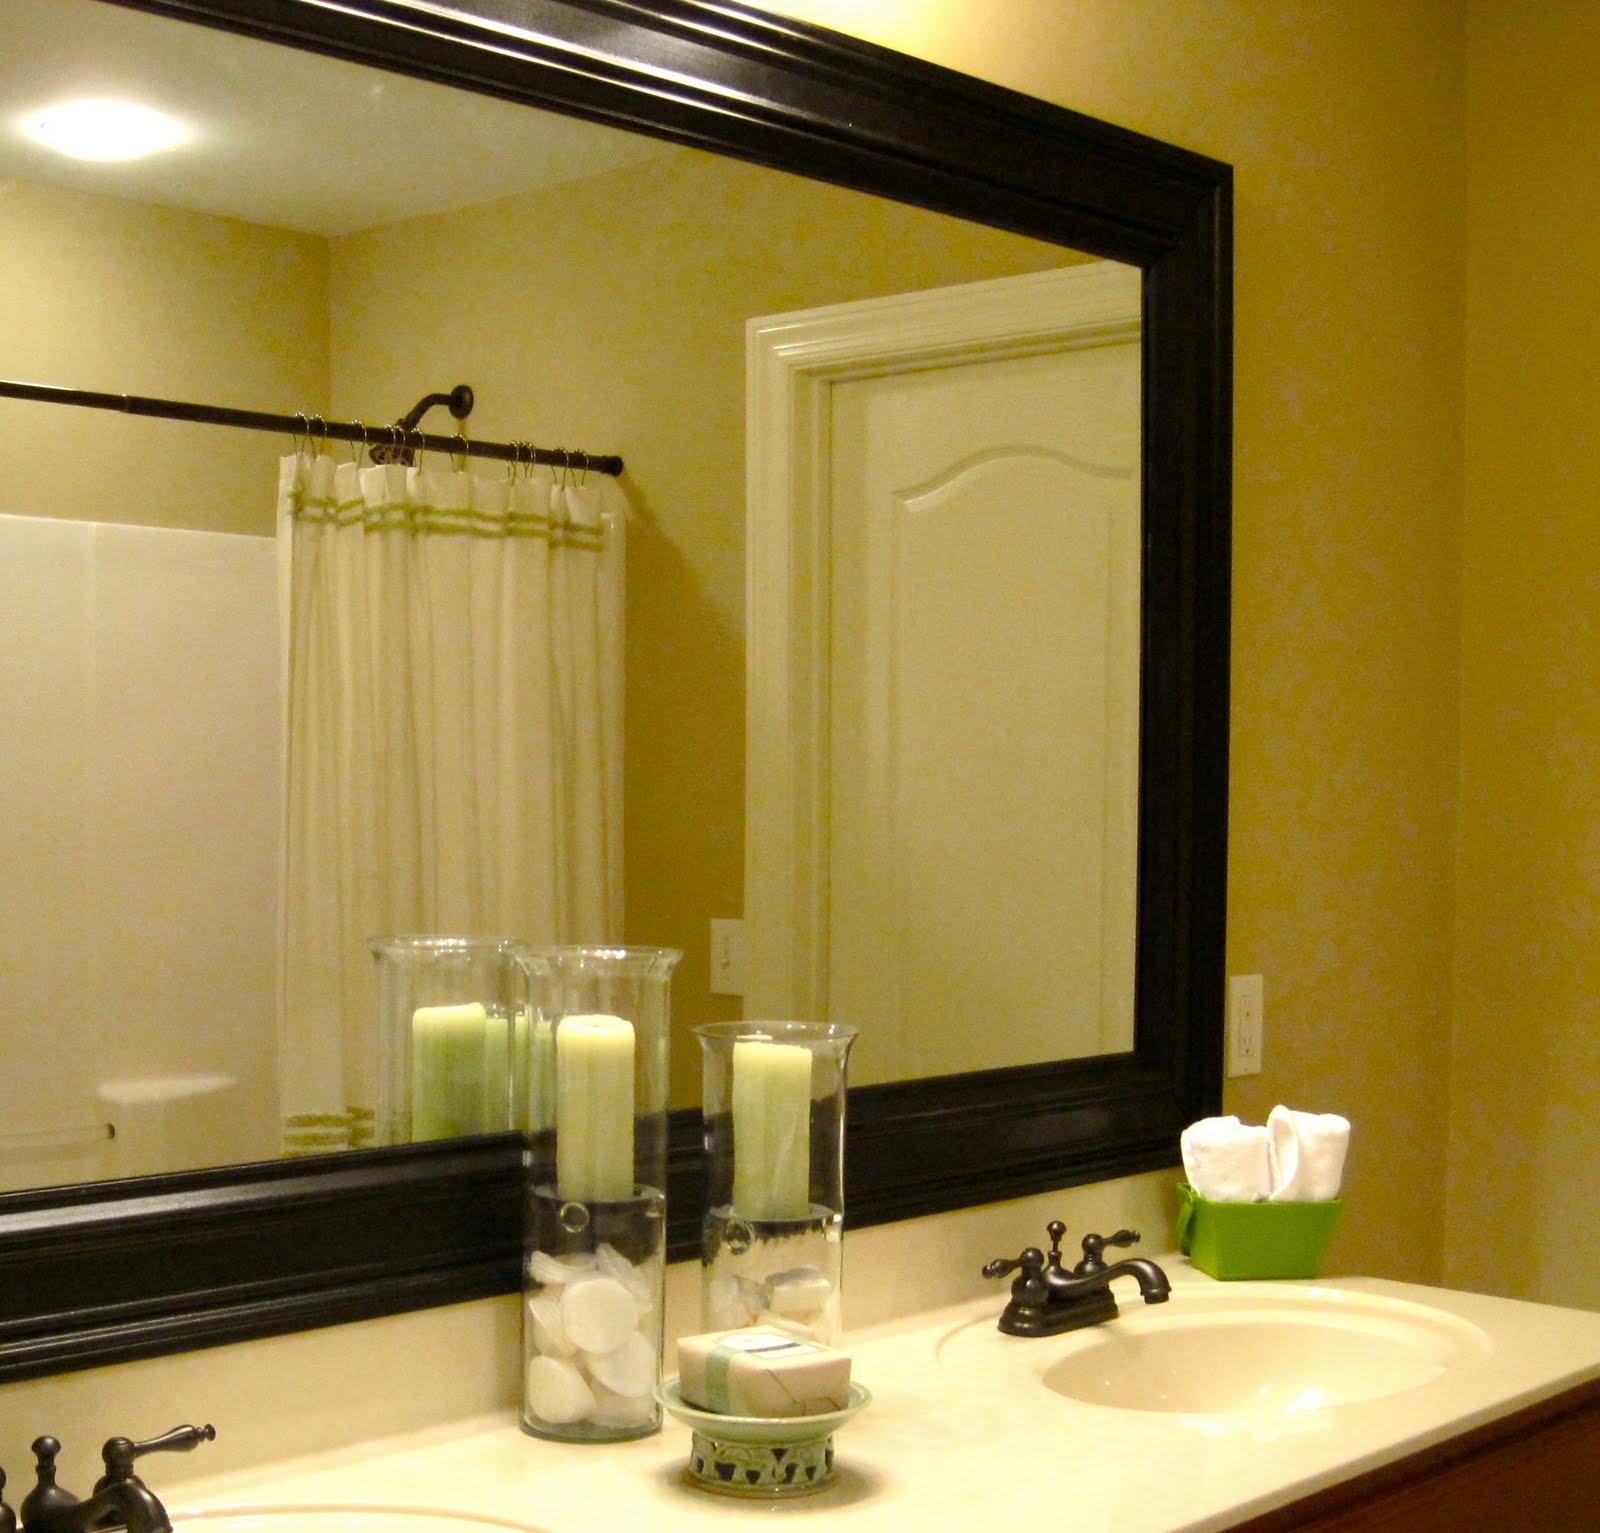 Bathroom Mirror Held With Clips